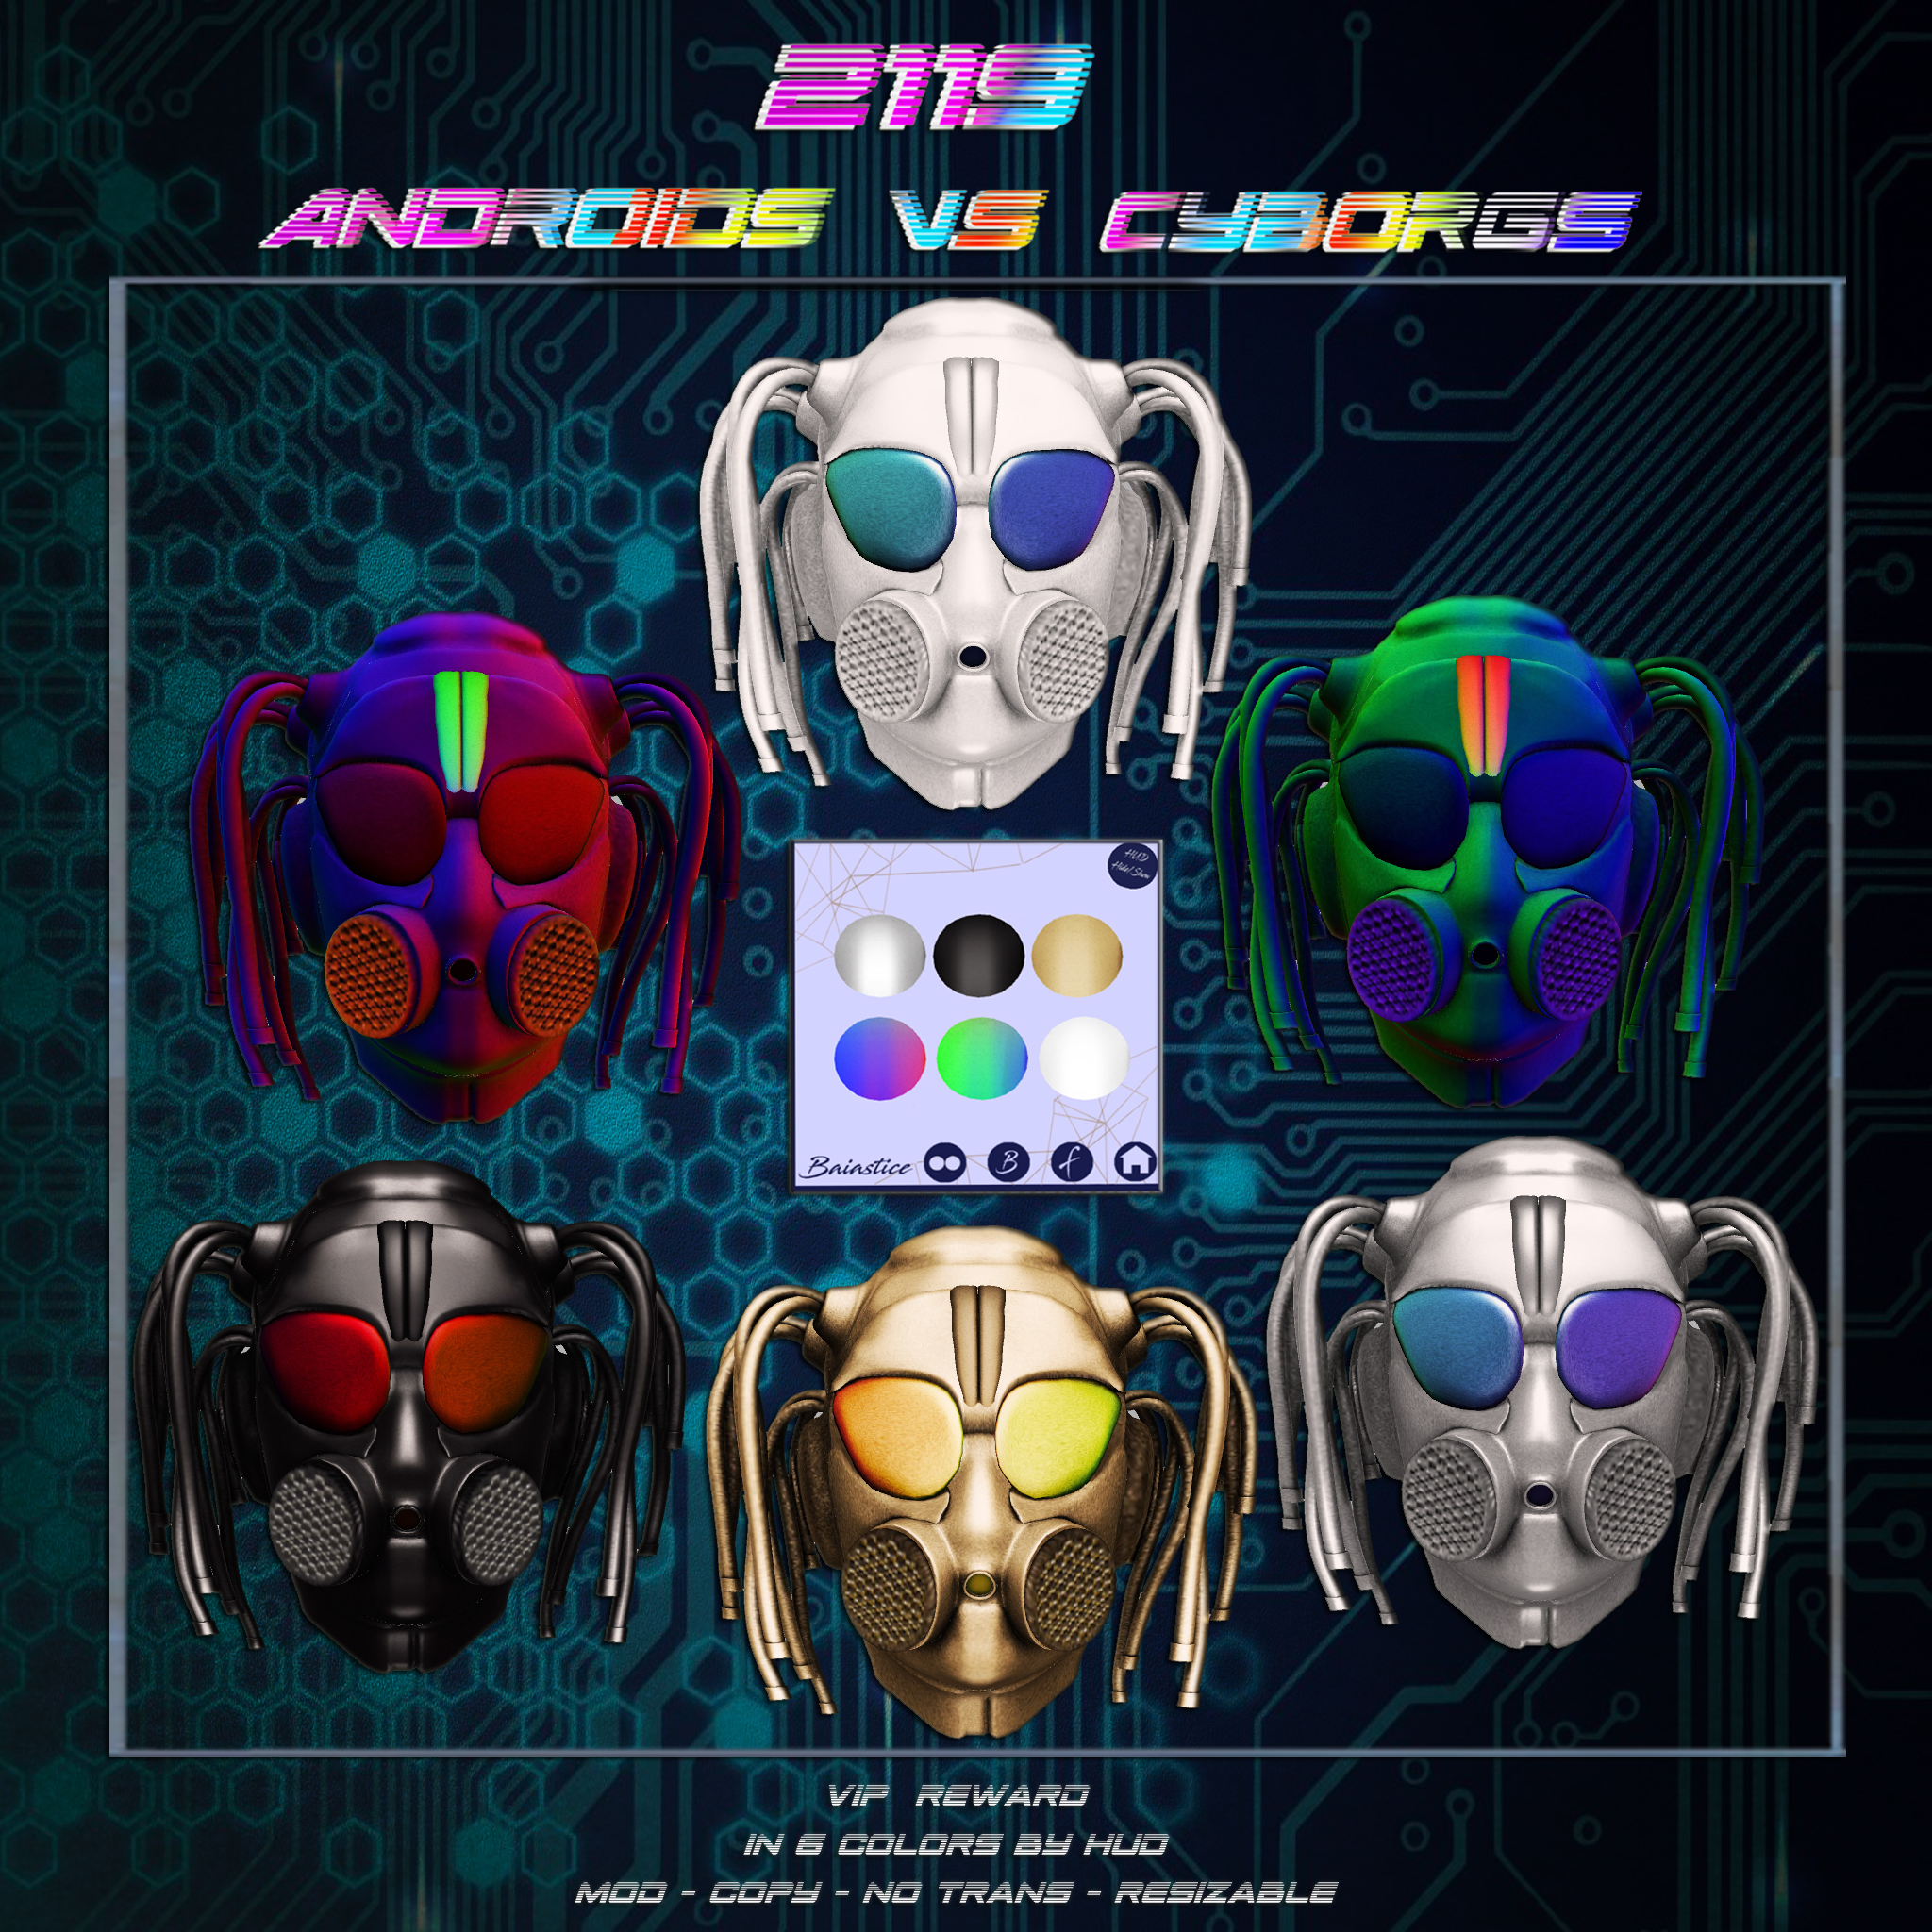 Baiastice_2119 Androids VS Cyborgs vip reward copy - Copy.jpg